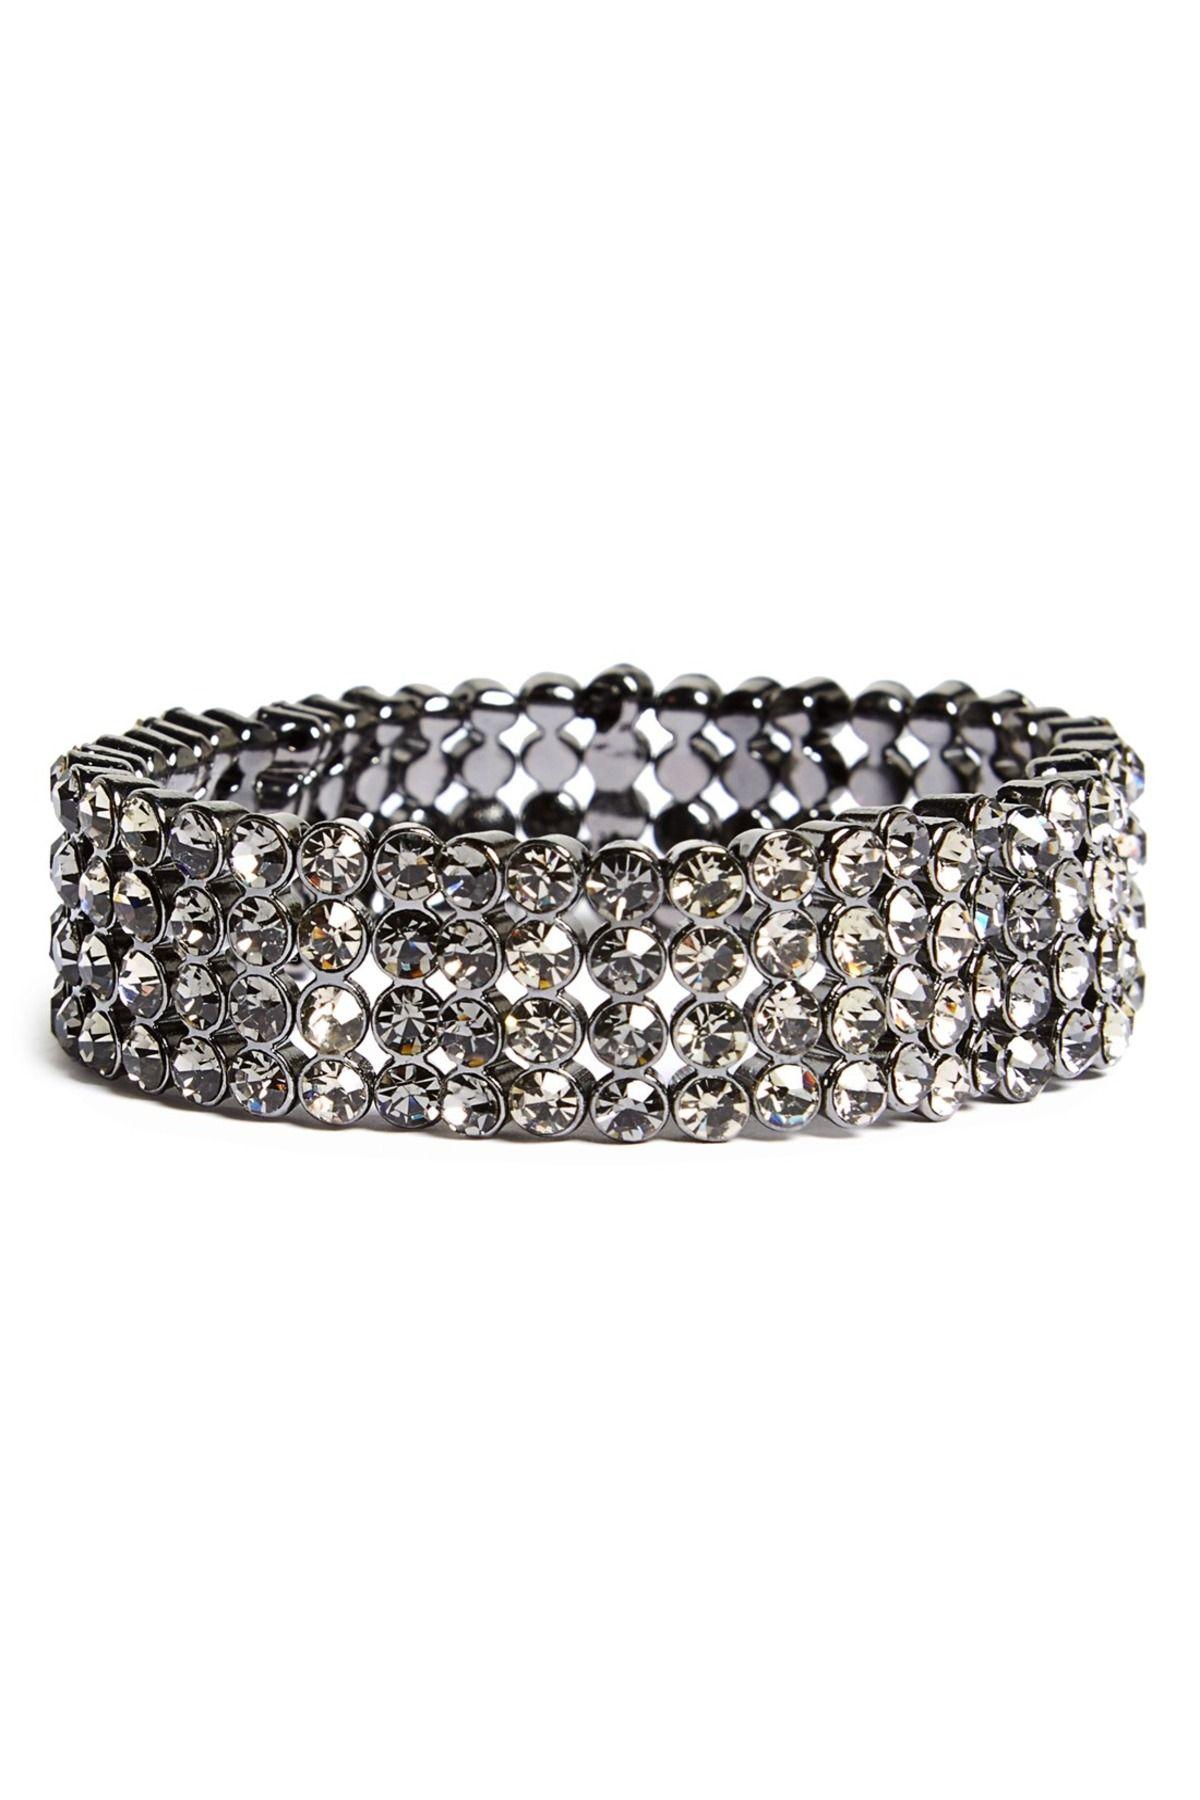 Natasha Accessories Natasha Crystal Hematite Stretch Bracelet UC703y